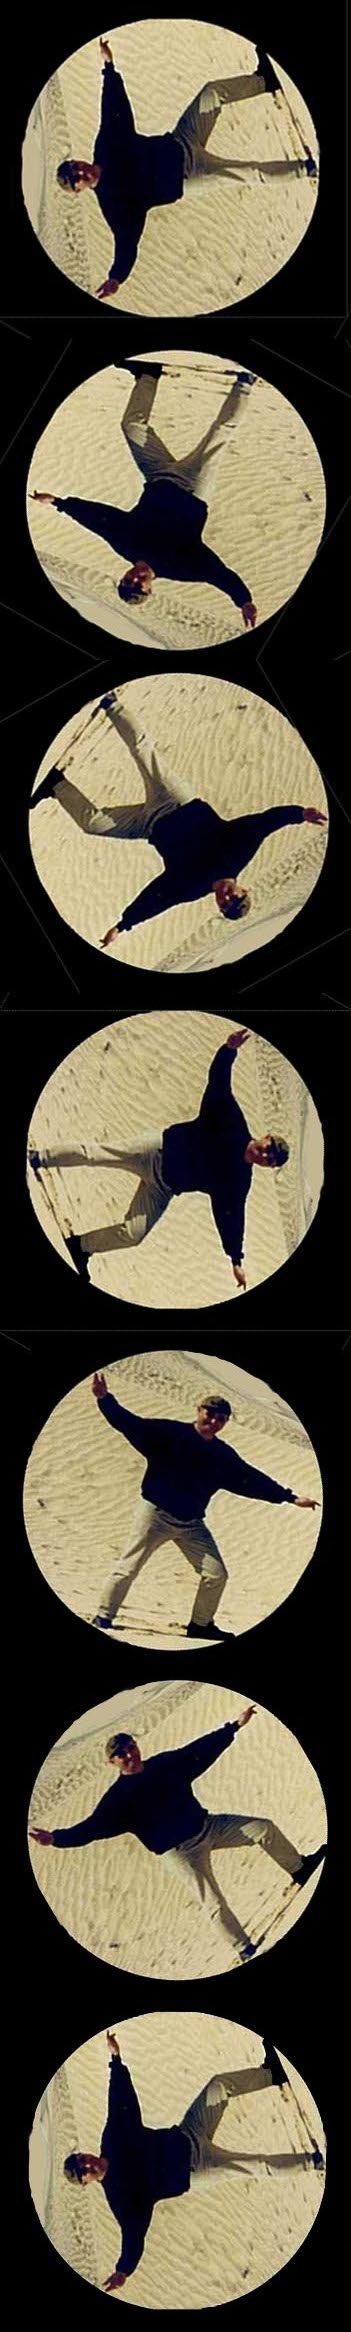 douz cartwheel by rangutan